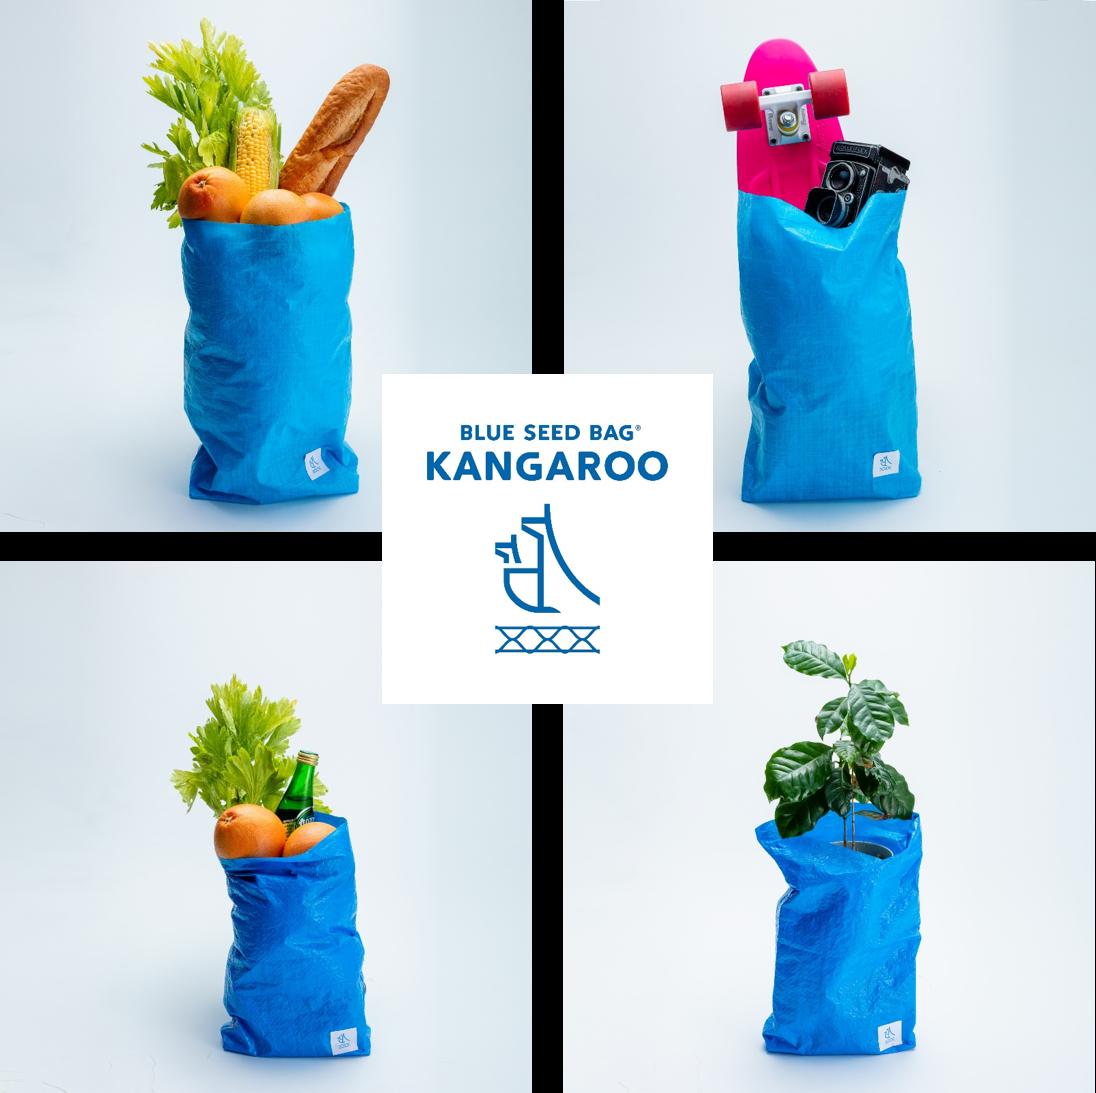 BLUE SEED BAG®KANGAROO使用イメージ